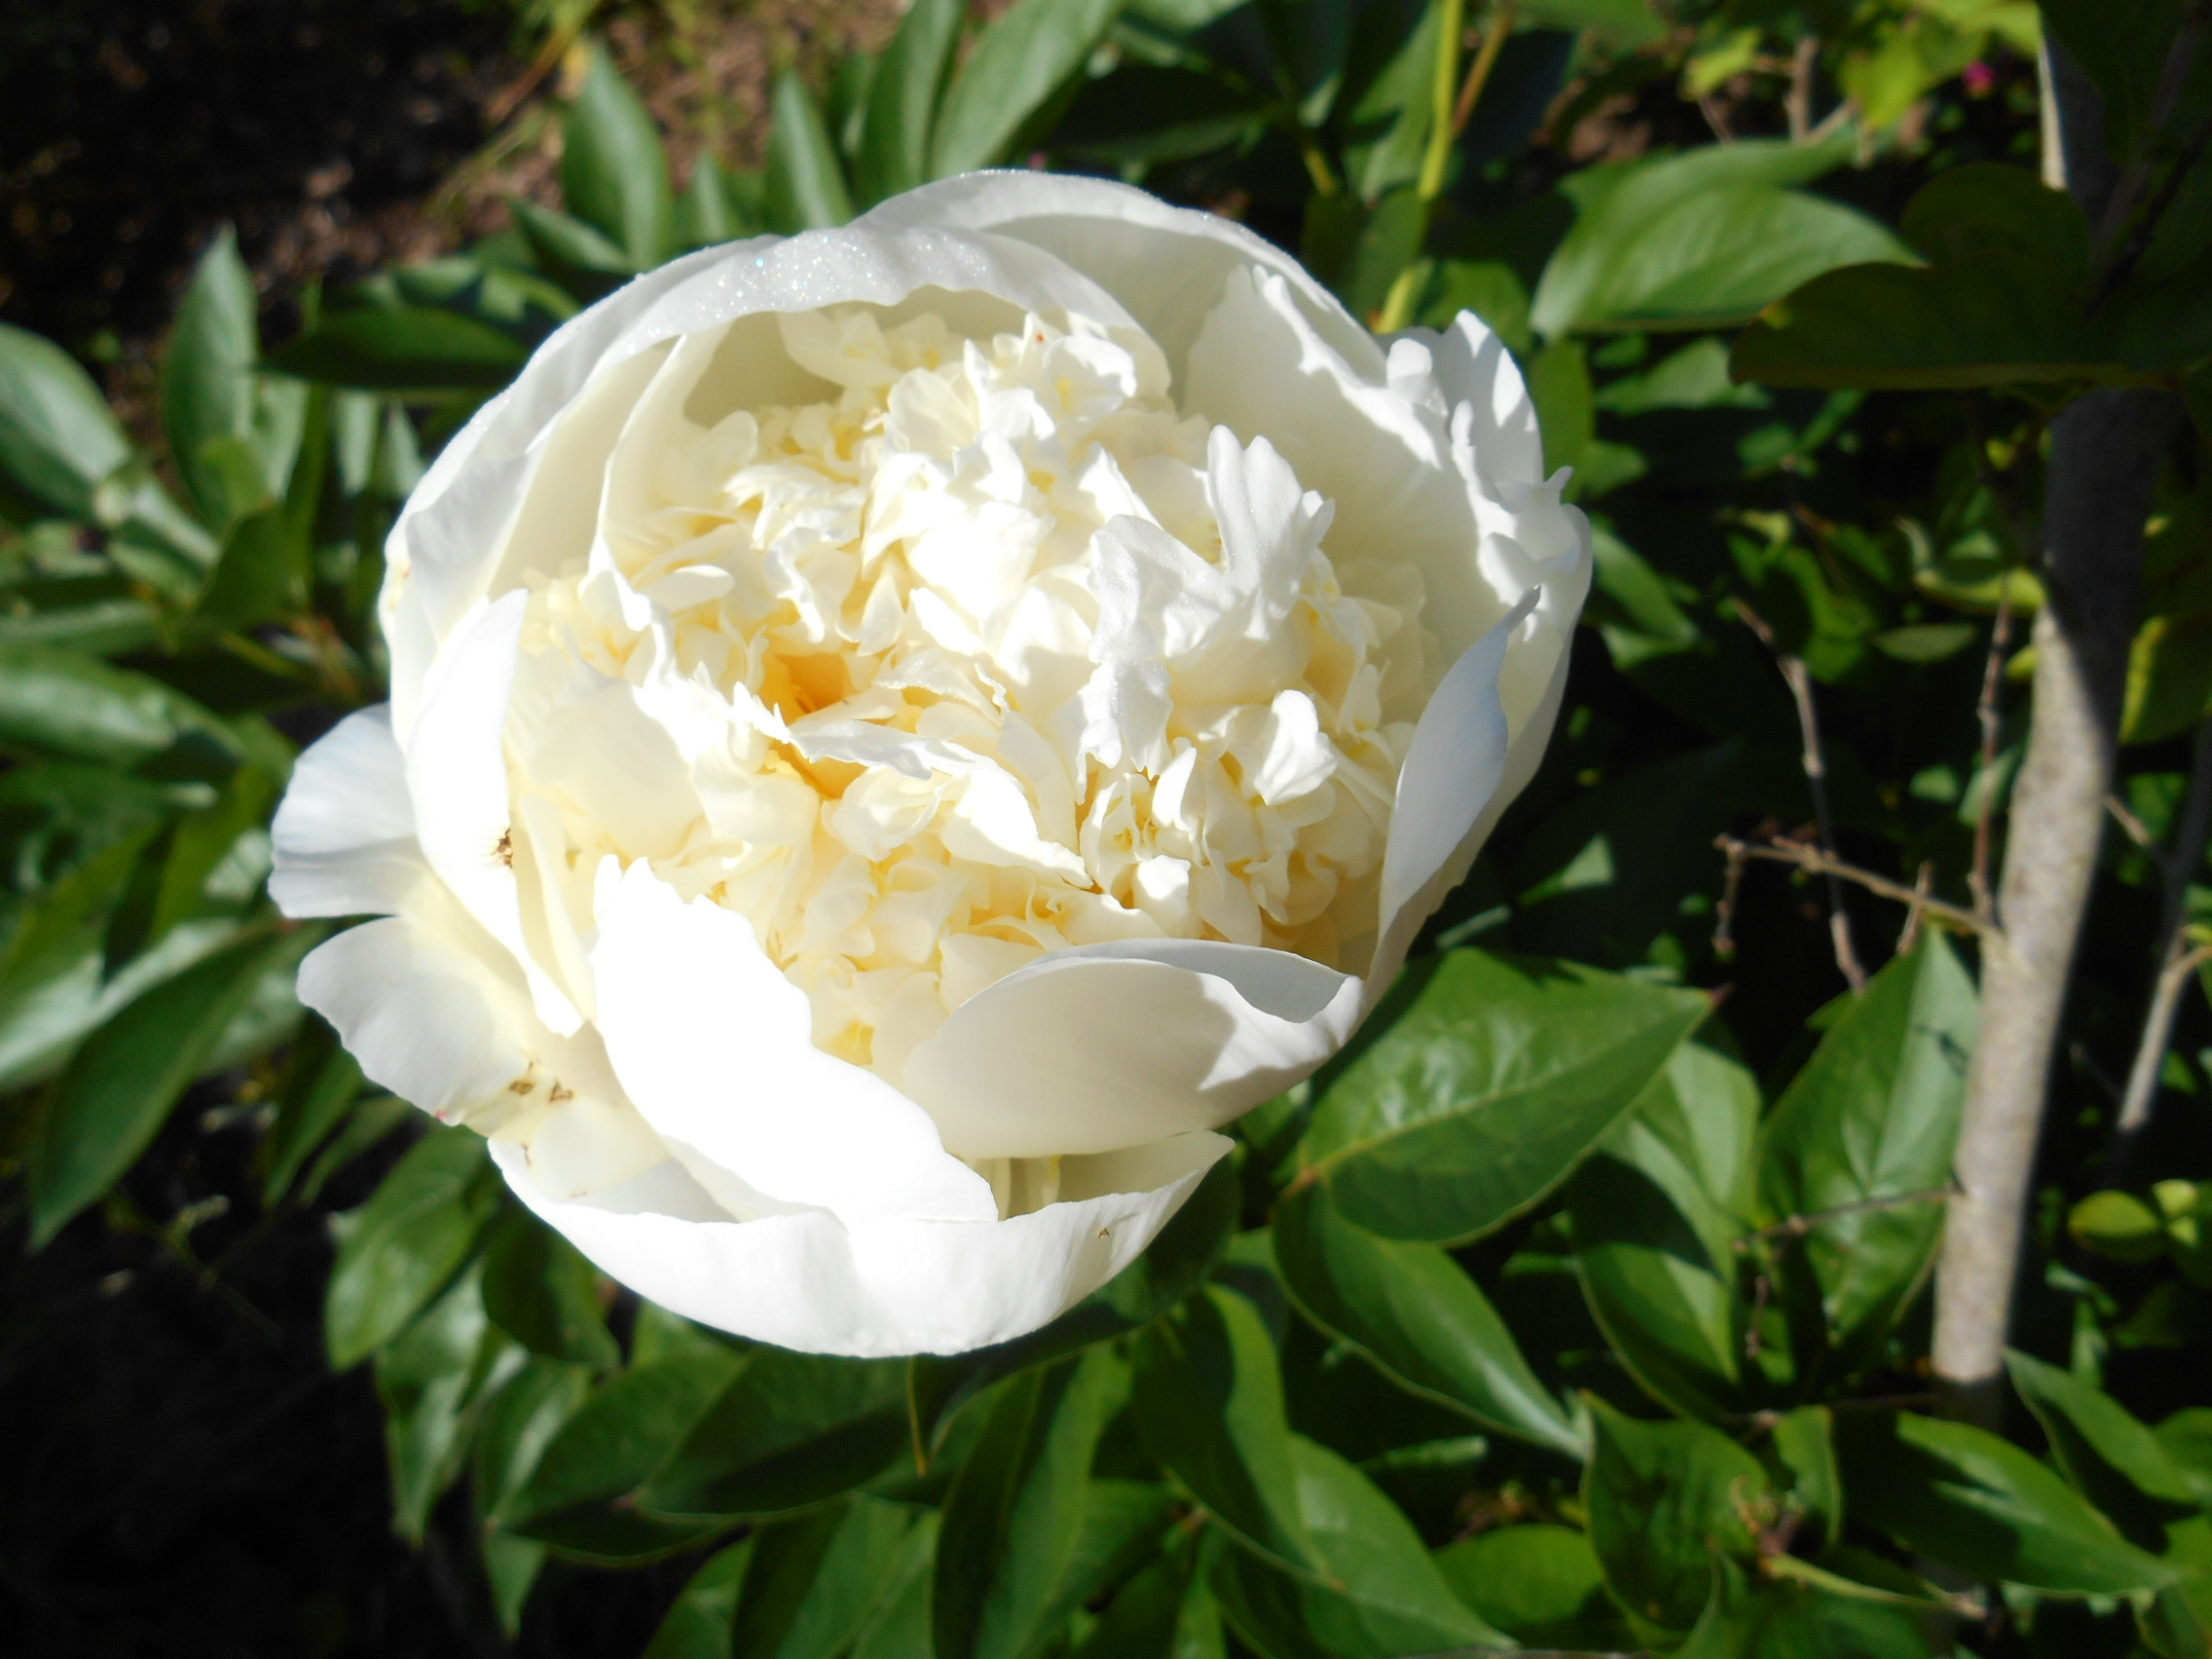 White peonies May 25 _14 001.JPG